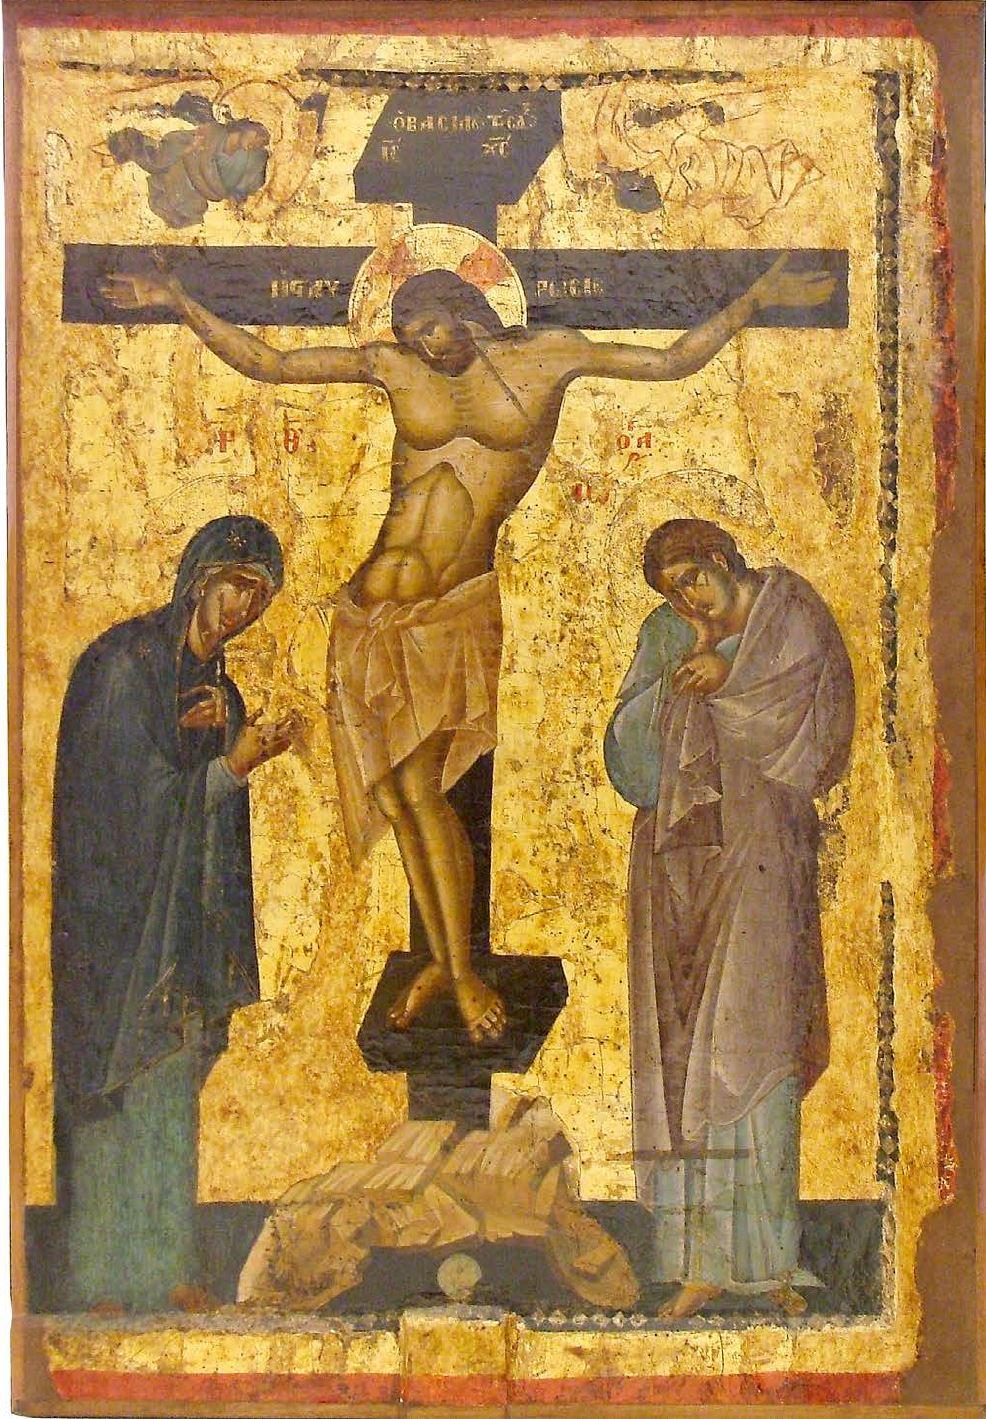 1275-1300 Crucifixion Icon gallery Ohrid Macedoine